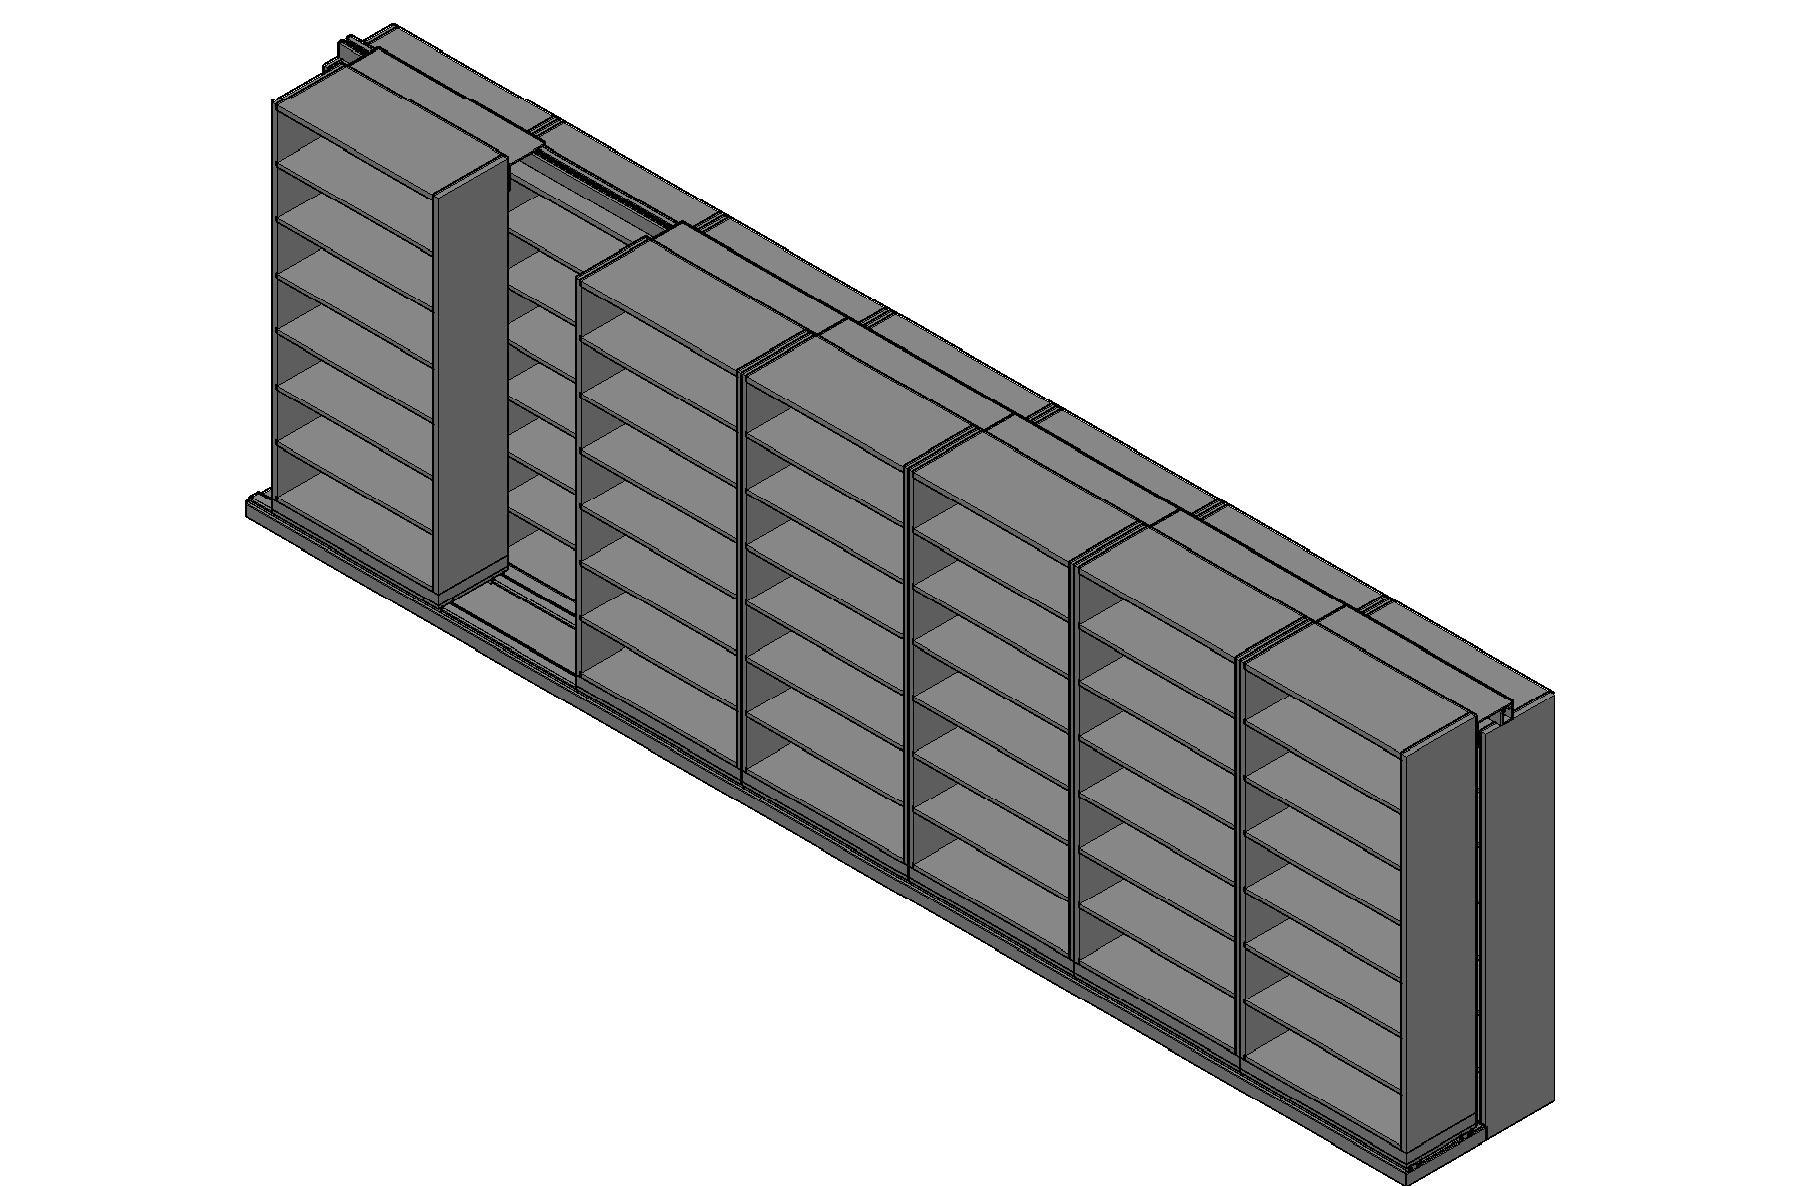 "Legal Size Sliding Shelves - 2 Rows Deep - 7 Levels - (36"" x 15"" Shelves) - 256"" Total Width"